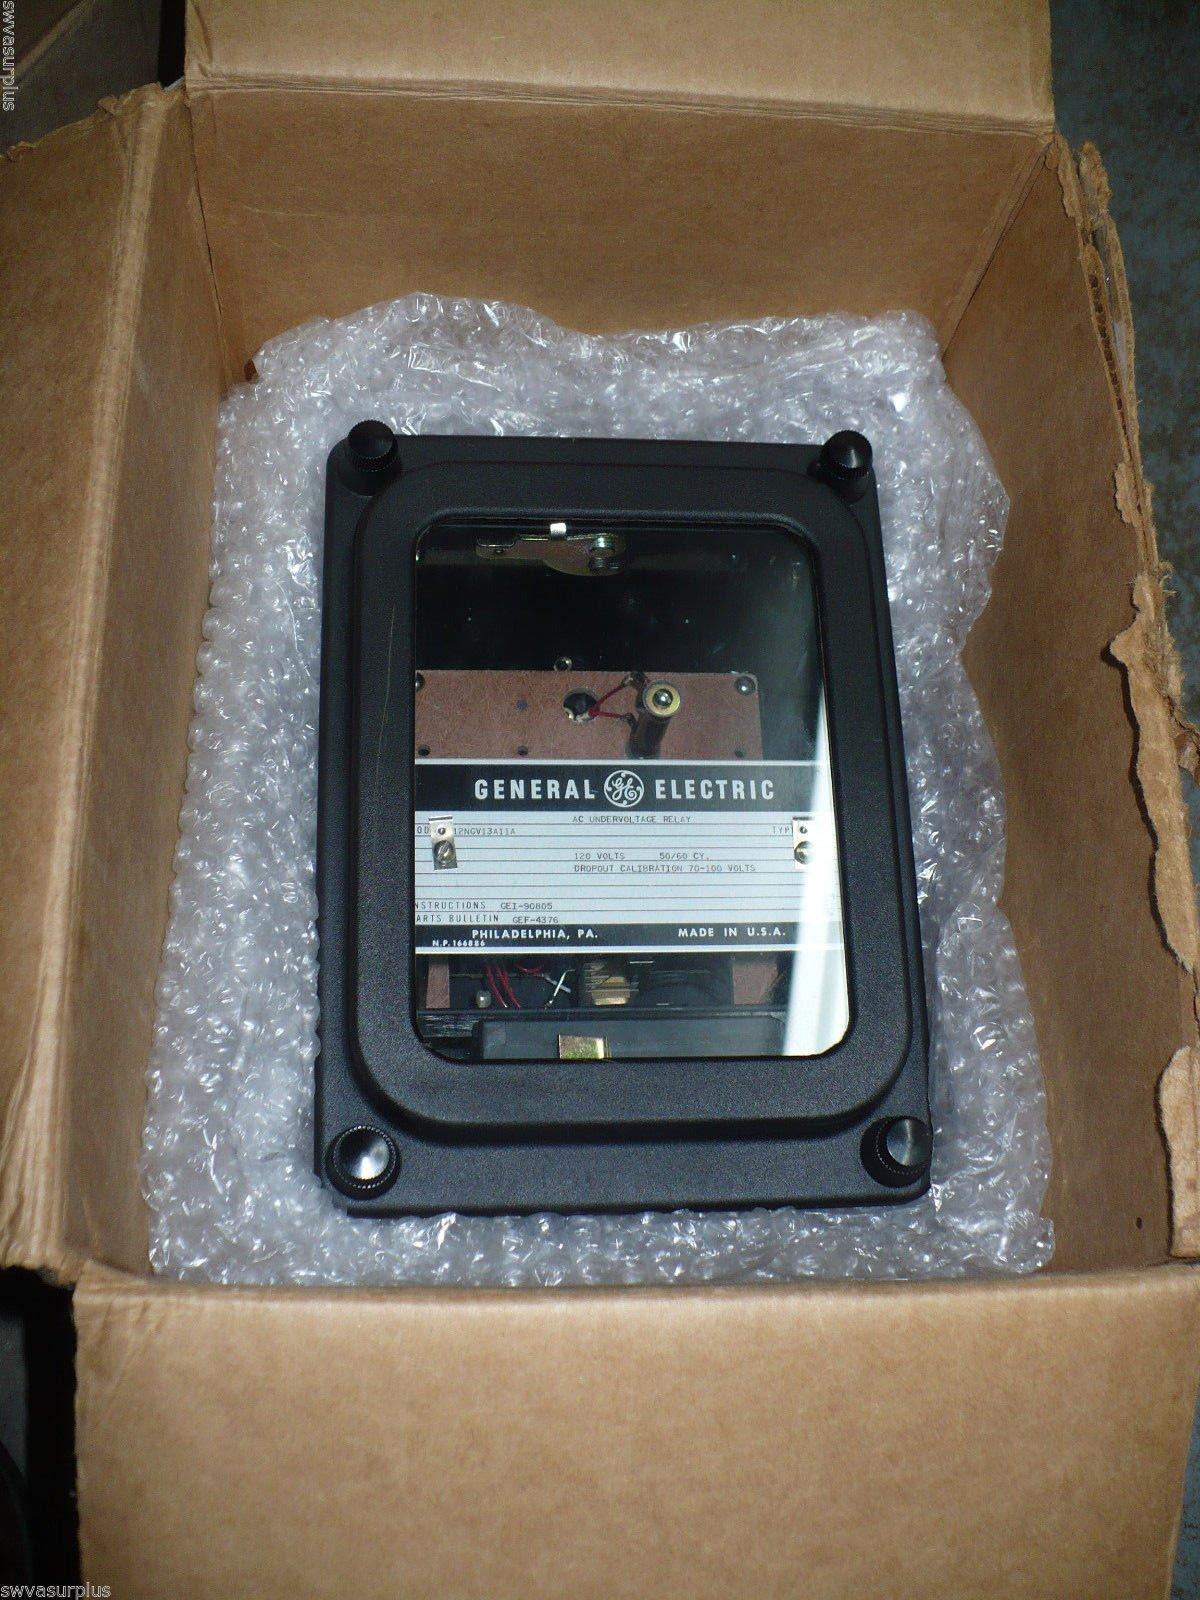 Ge 12NGV13A11A Ac Undervoltage Relay, 120 VAc, 50/60 Hz,